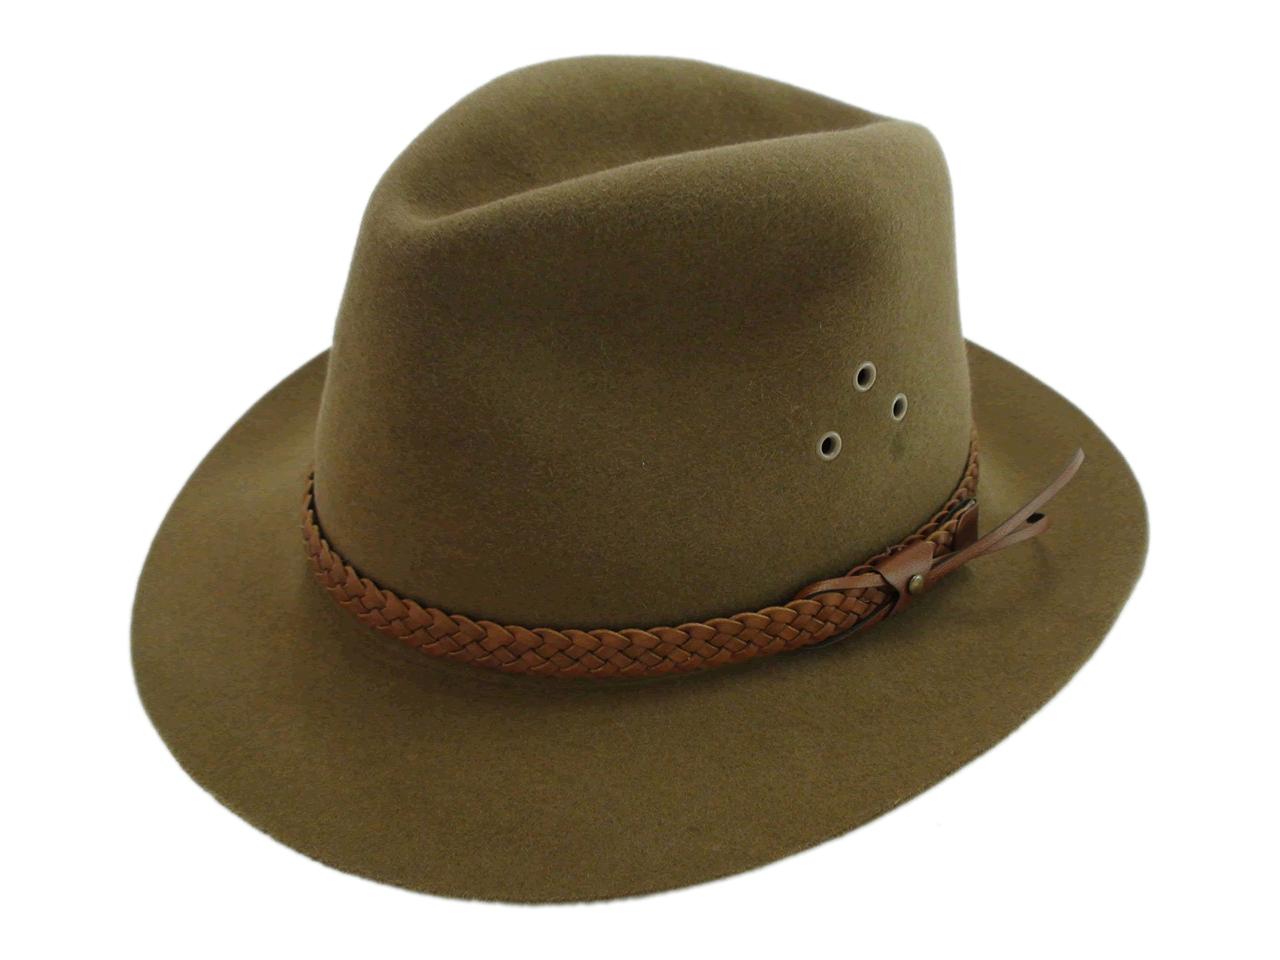 Vintage Adam Hats Genuine Fur Felt Brown Outback Fedora Hat Size 7 1 8″ 28da51dbe57